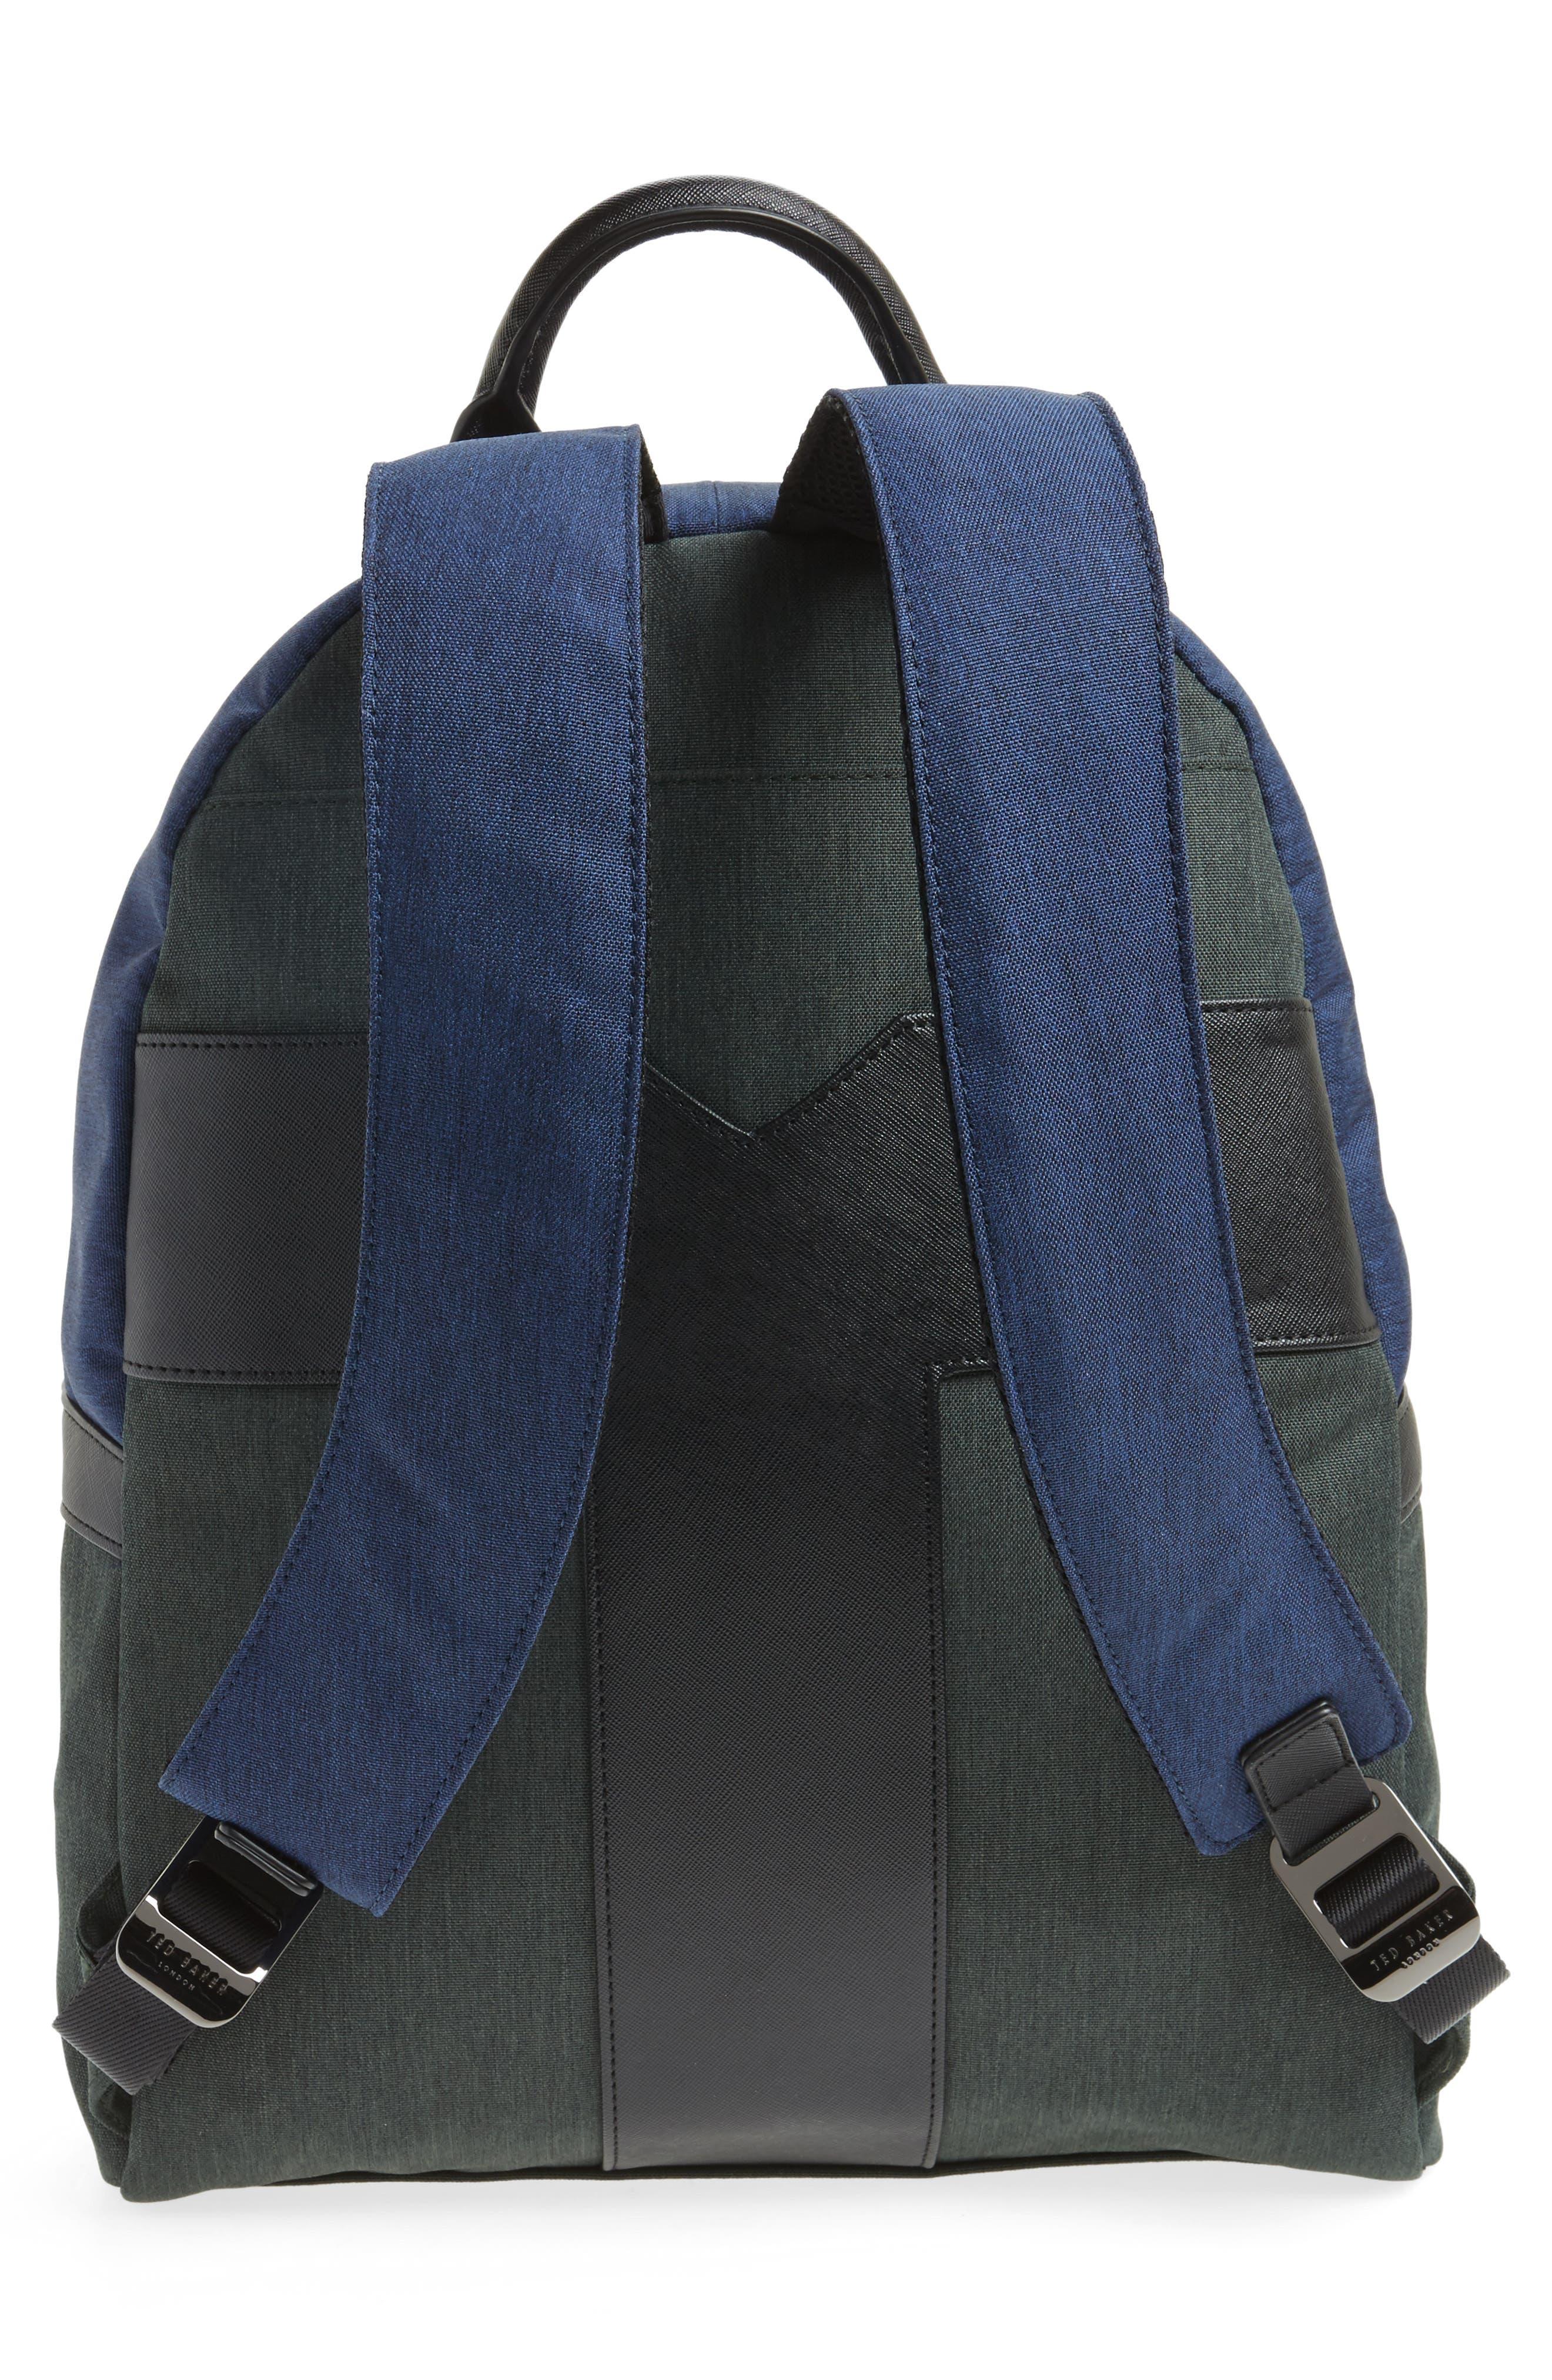 Zirabi Backpack,                             Alternate thumbnail 6, color,